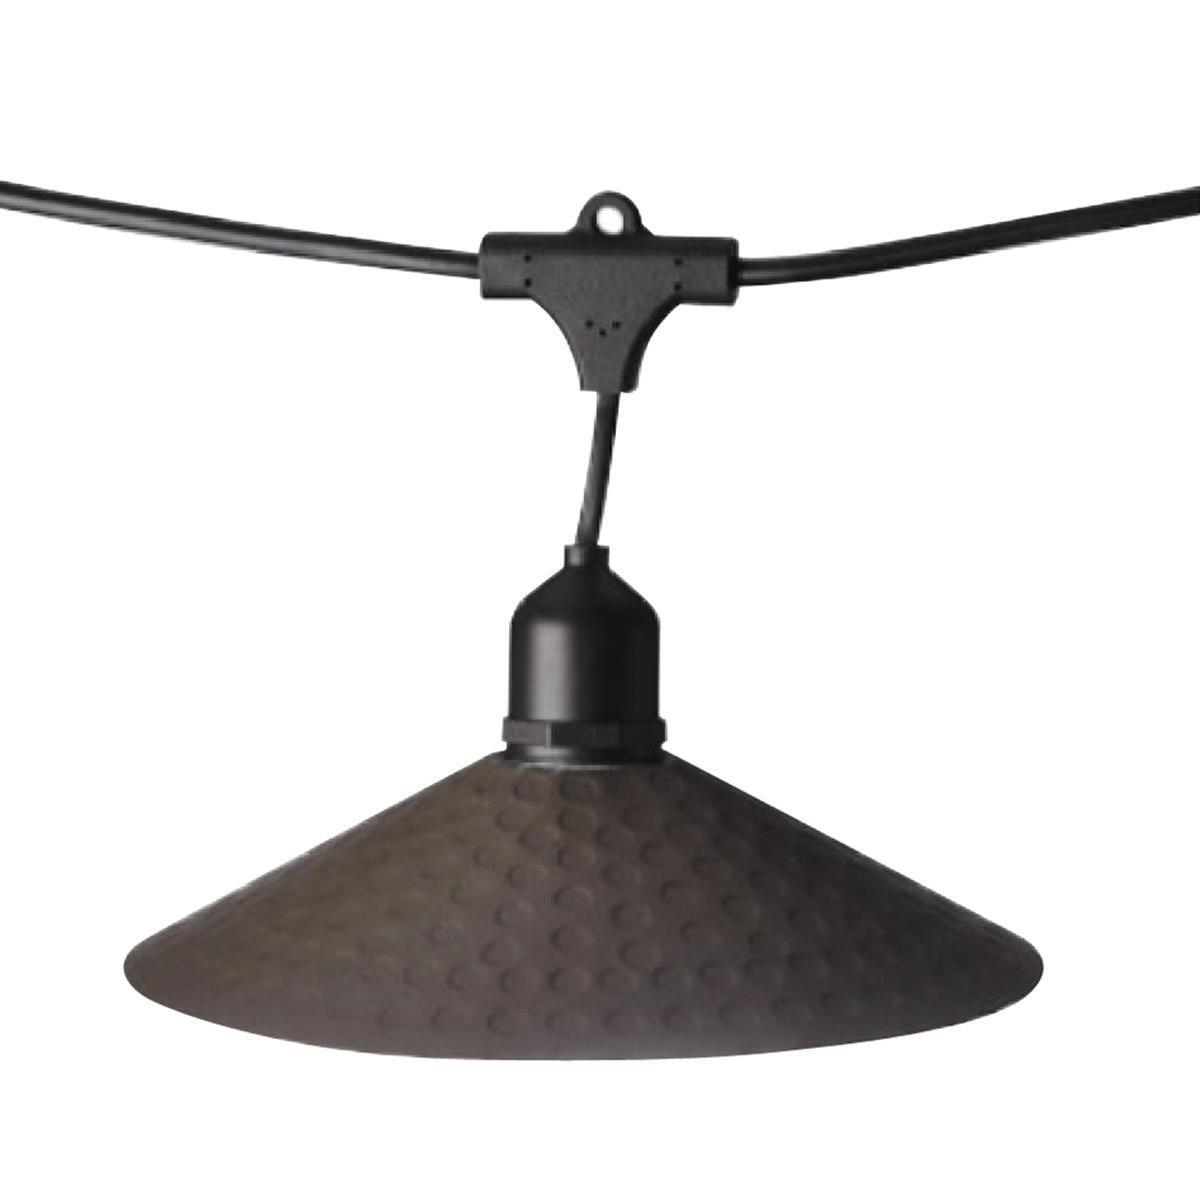 Ghirlanda VINTY 10 lampadine 7 m IP44 LUMISKY - 4